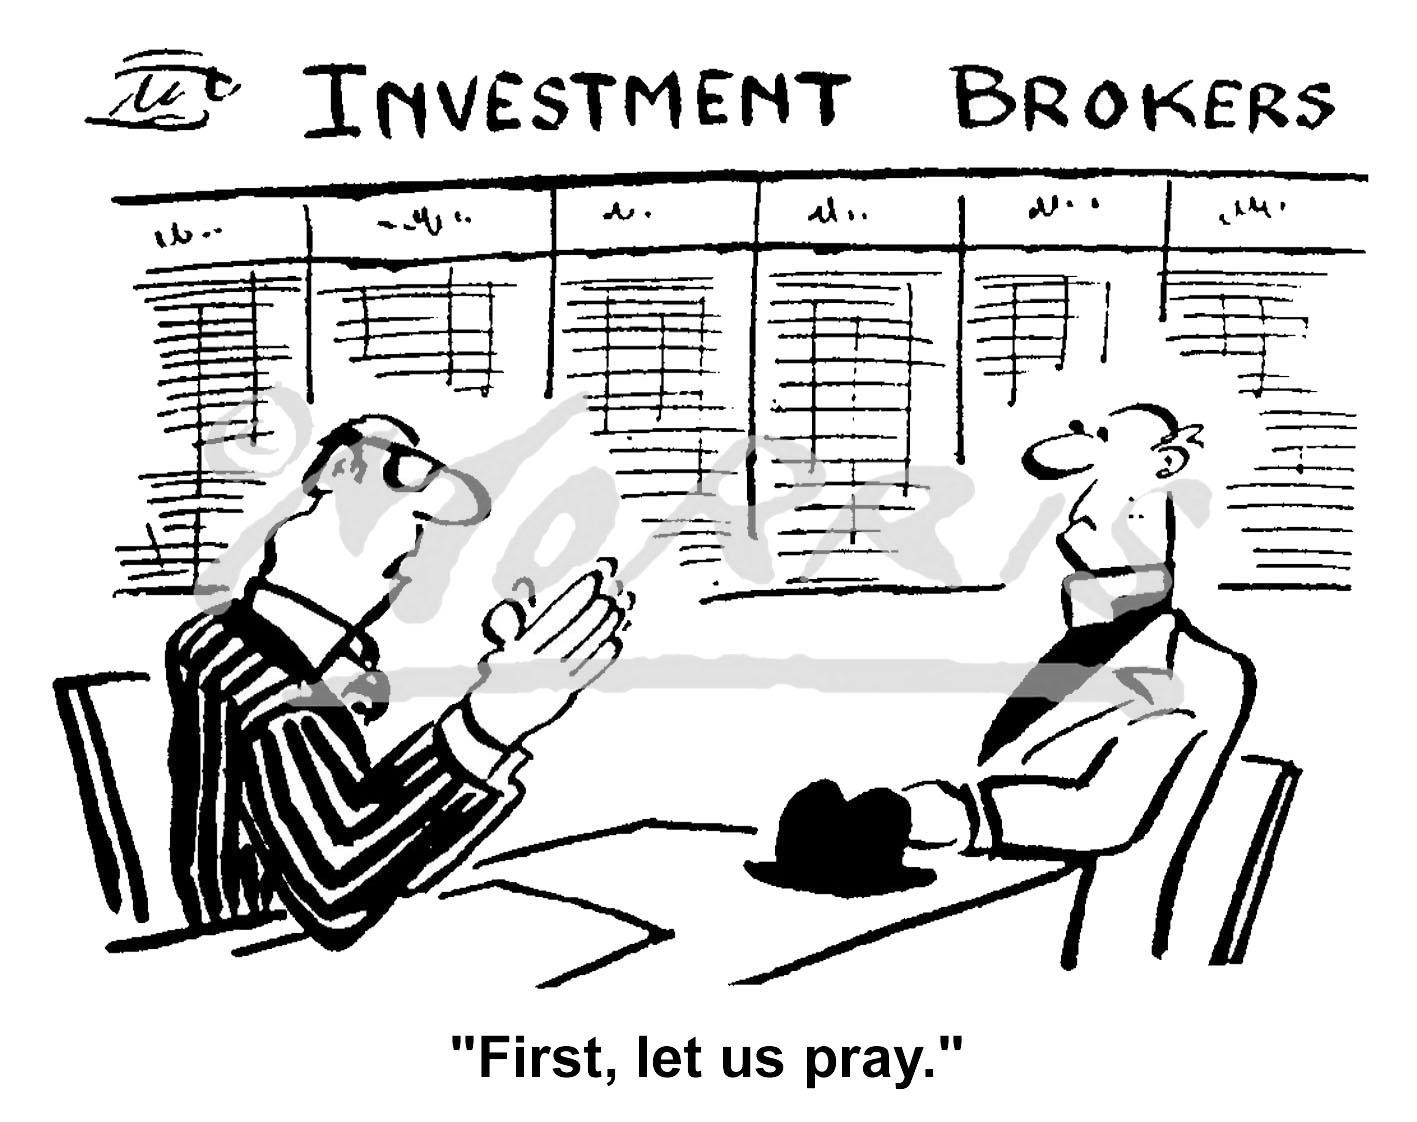 Investment broker business cartoon Ref: 0359bw